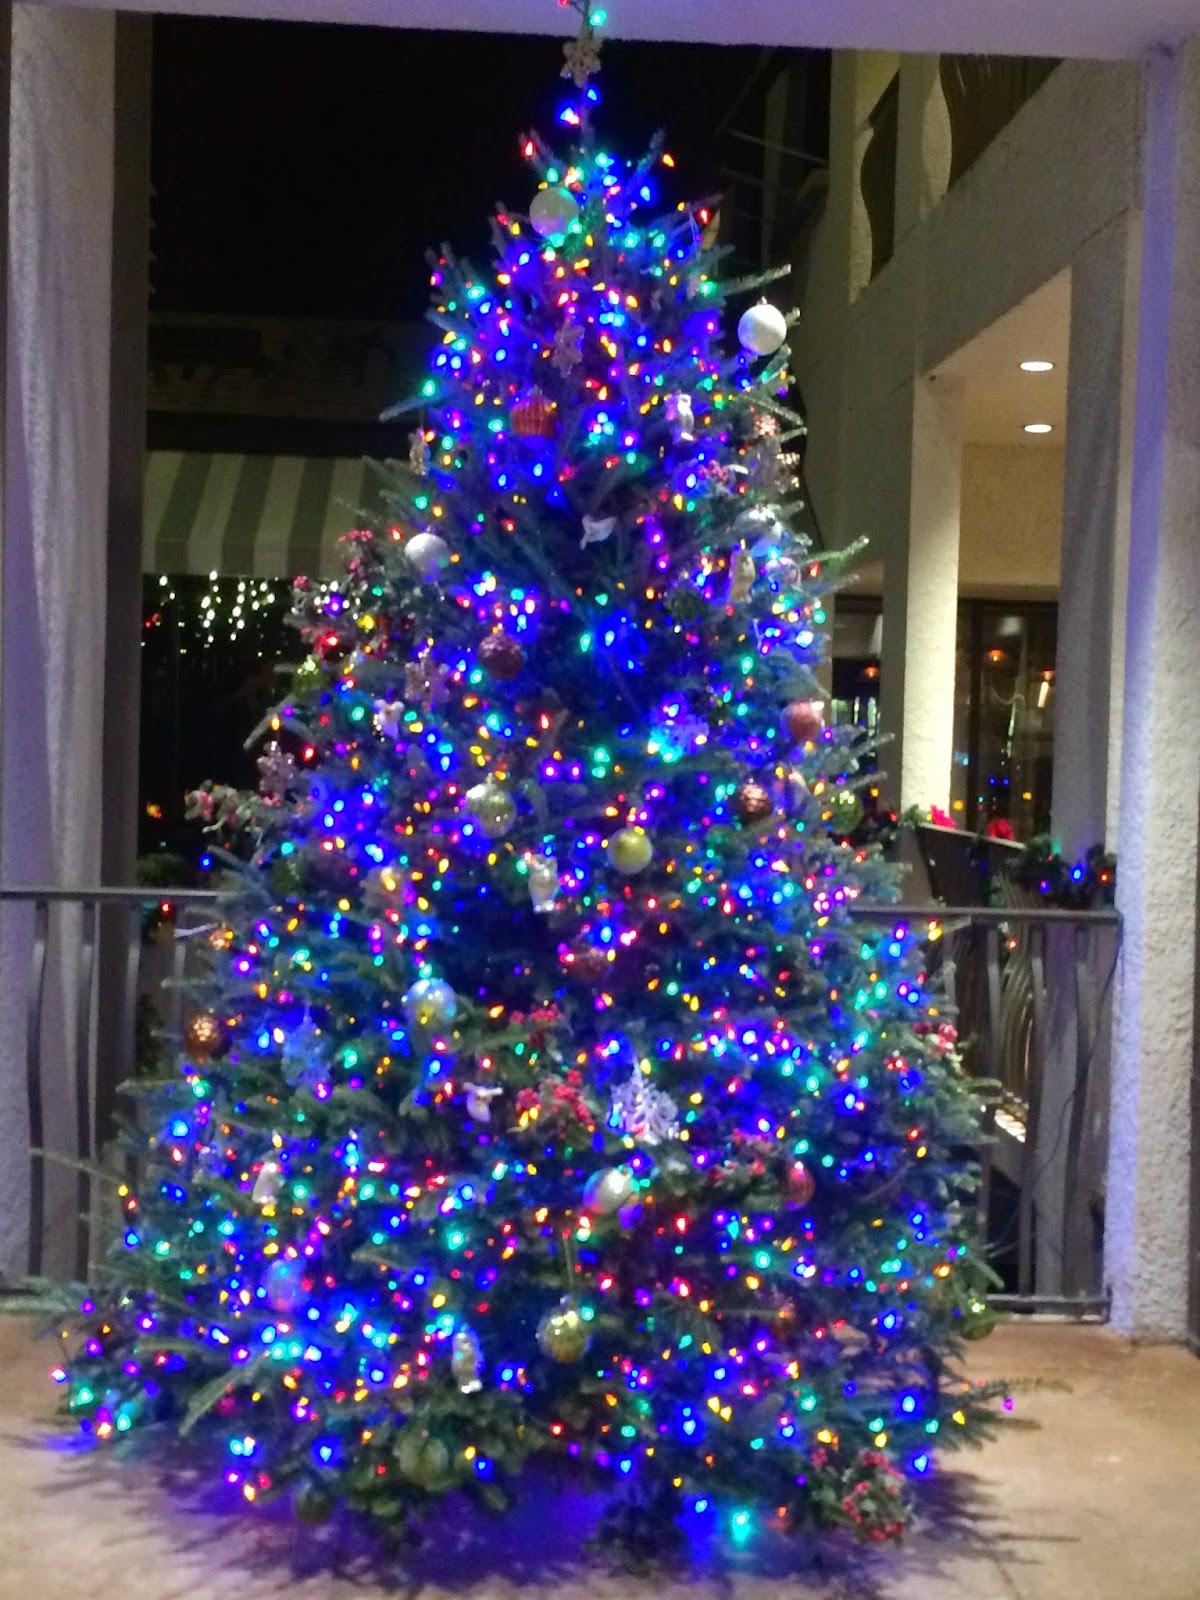 Dan Cirucci: Magical Island Glows With Christmas Spirit!